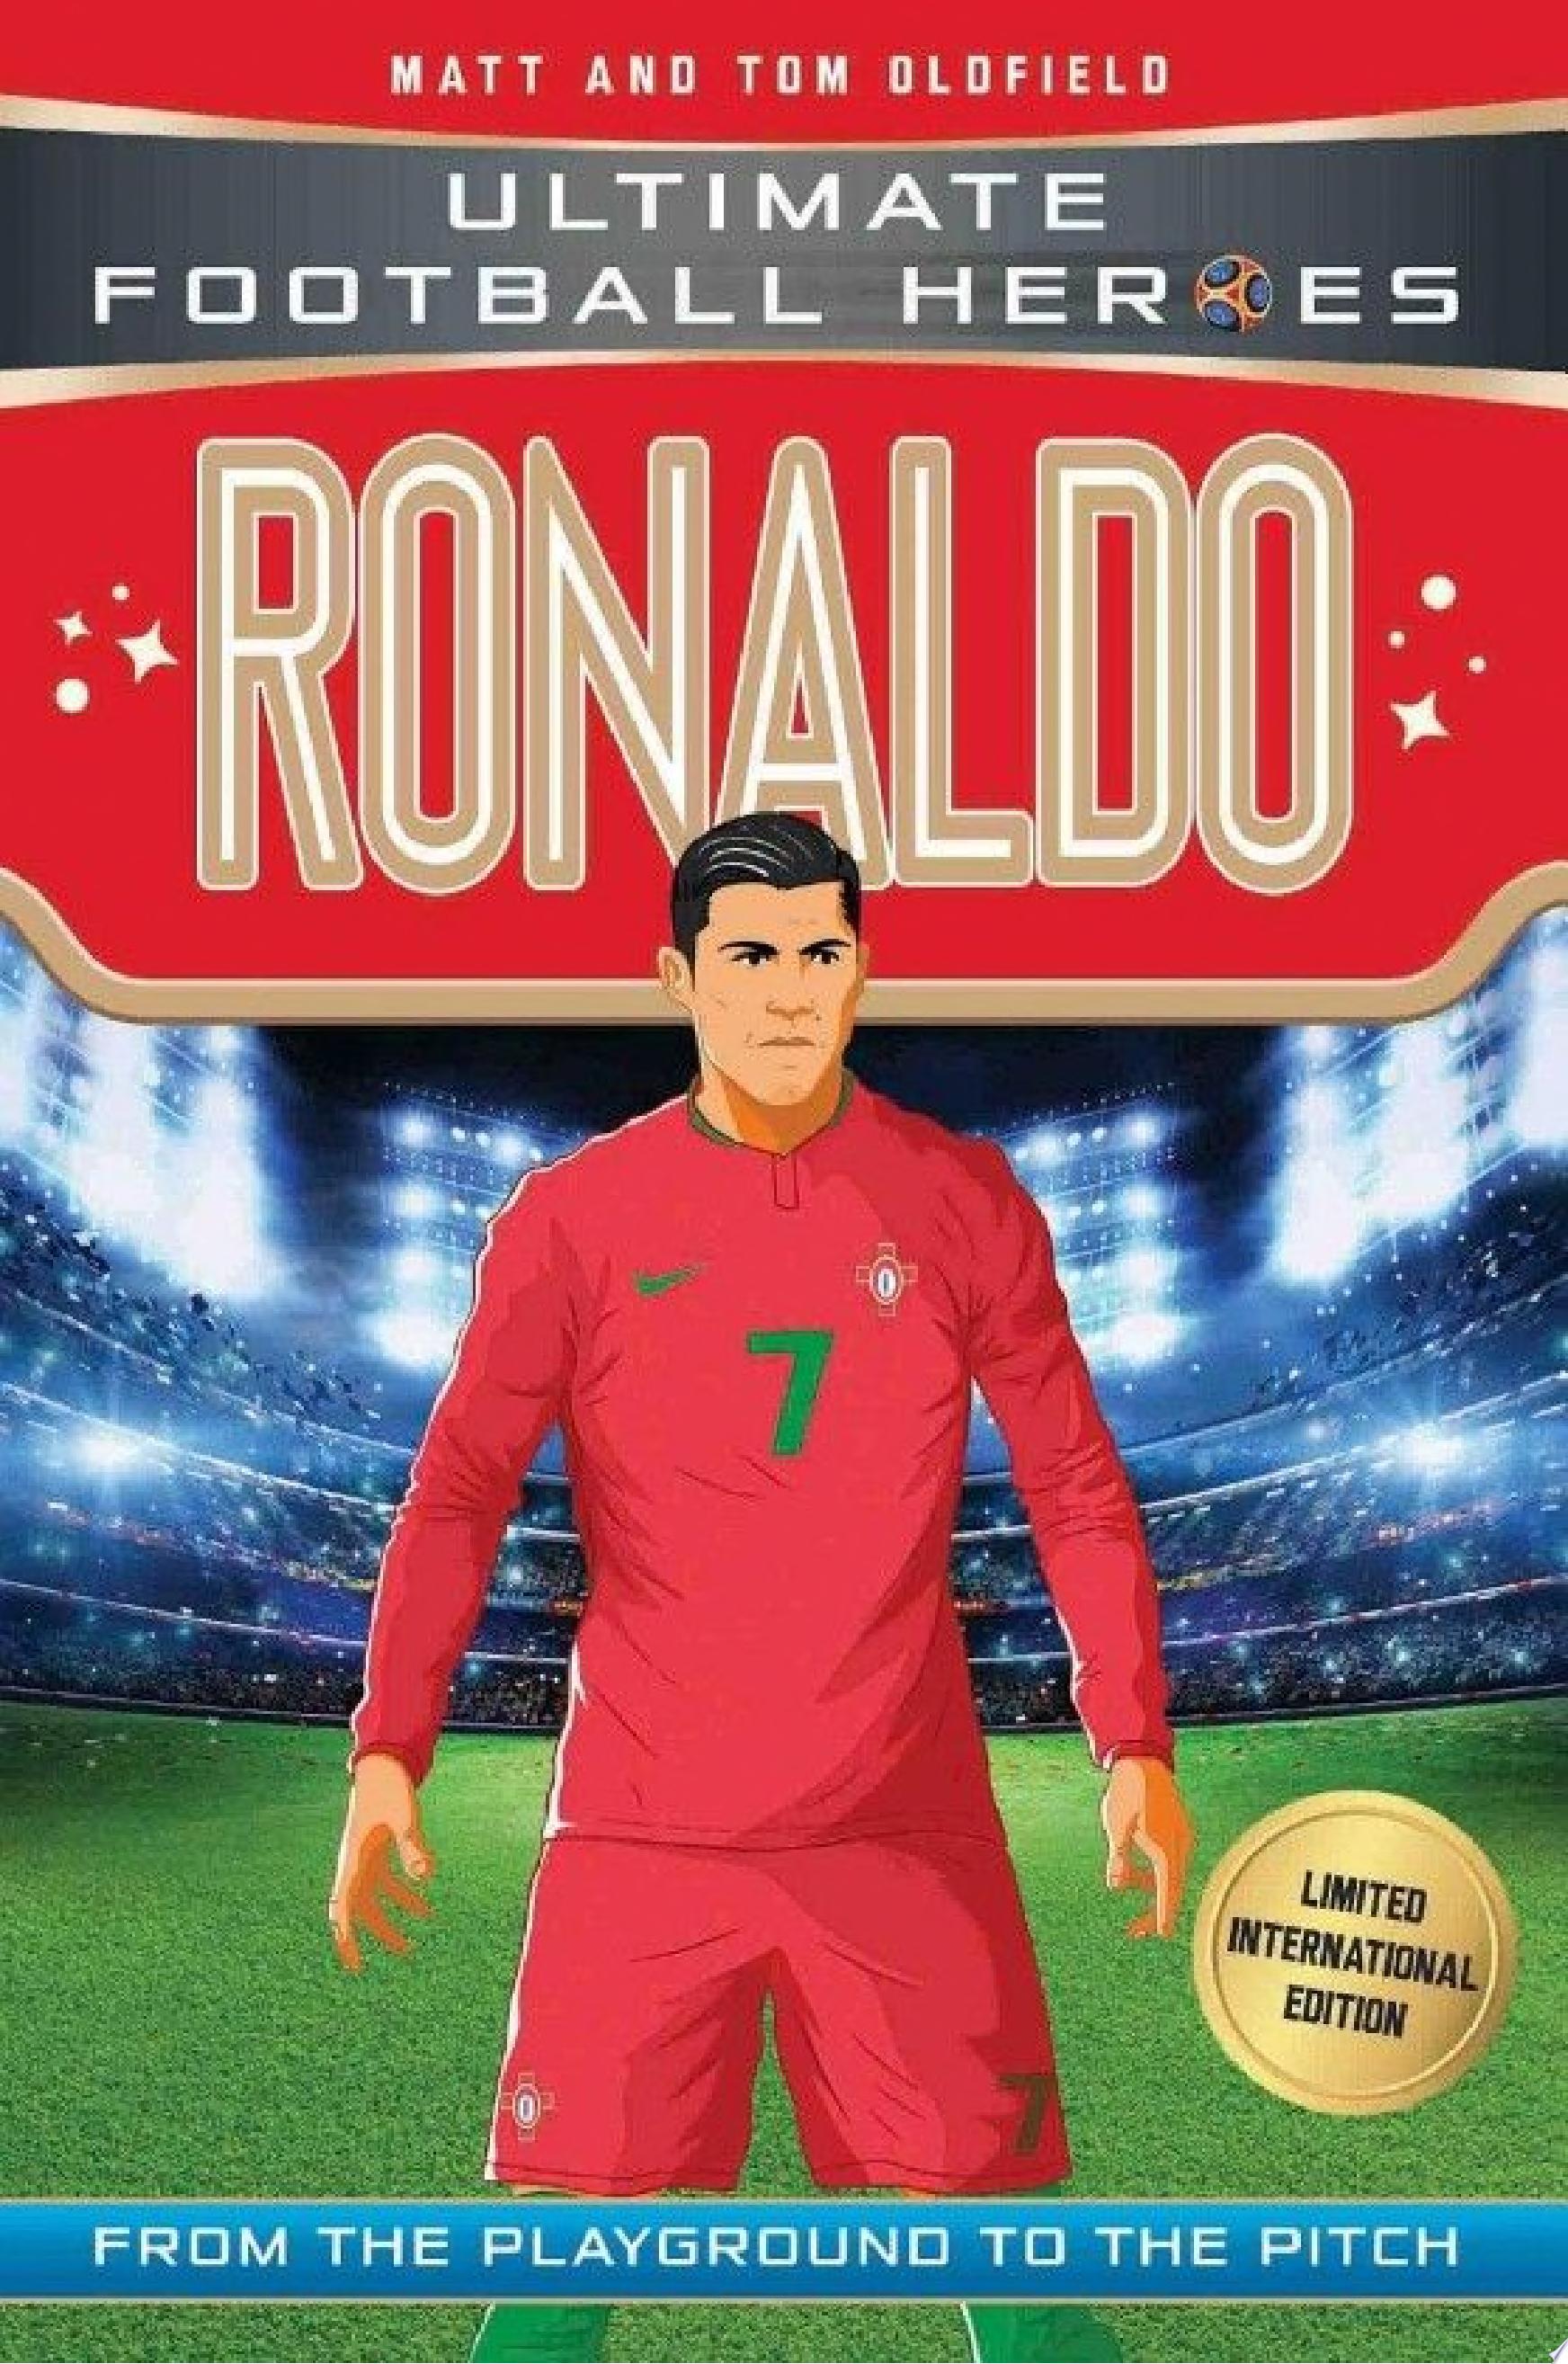 Ronaldo  Ultimate Football Heroes   Limited International Edition